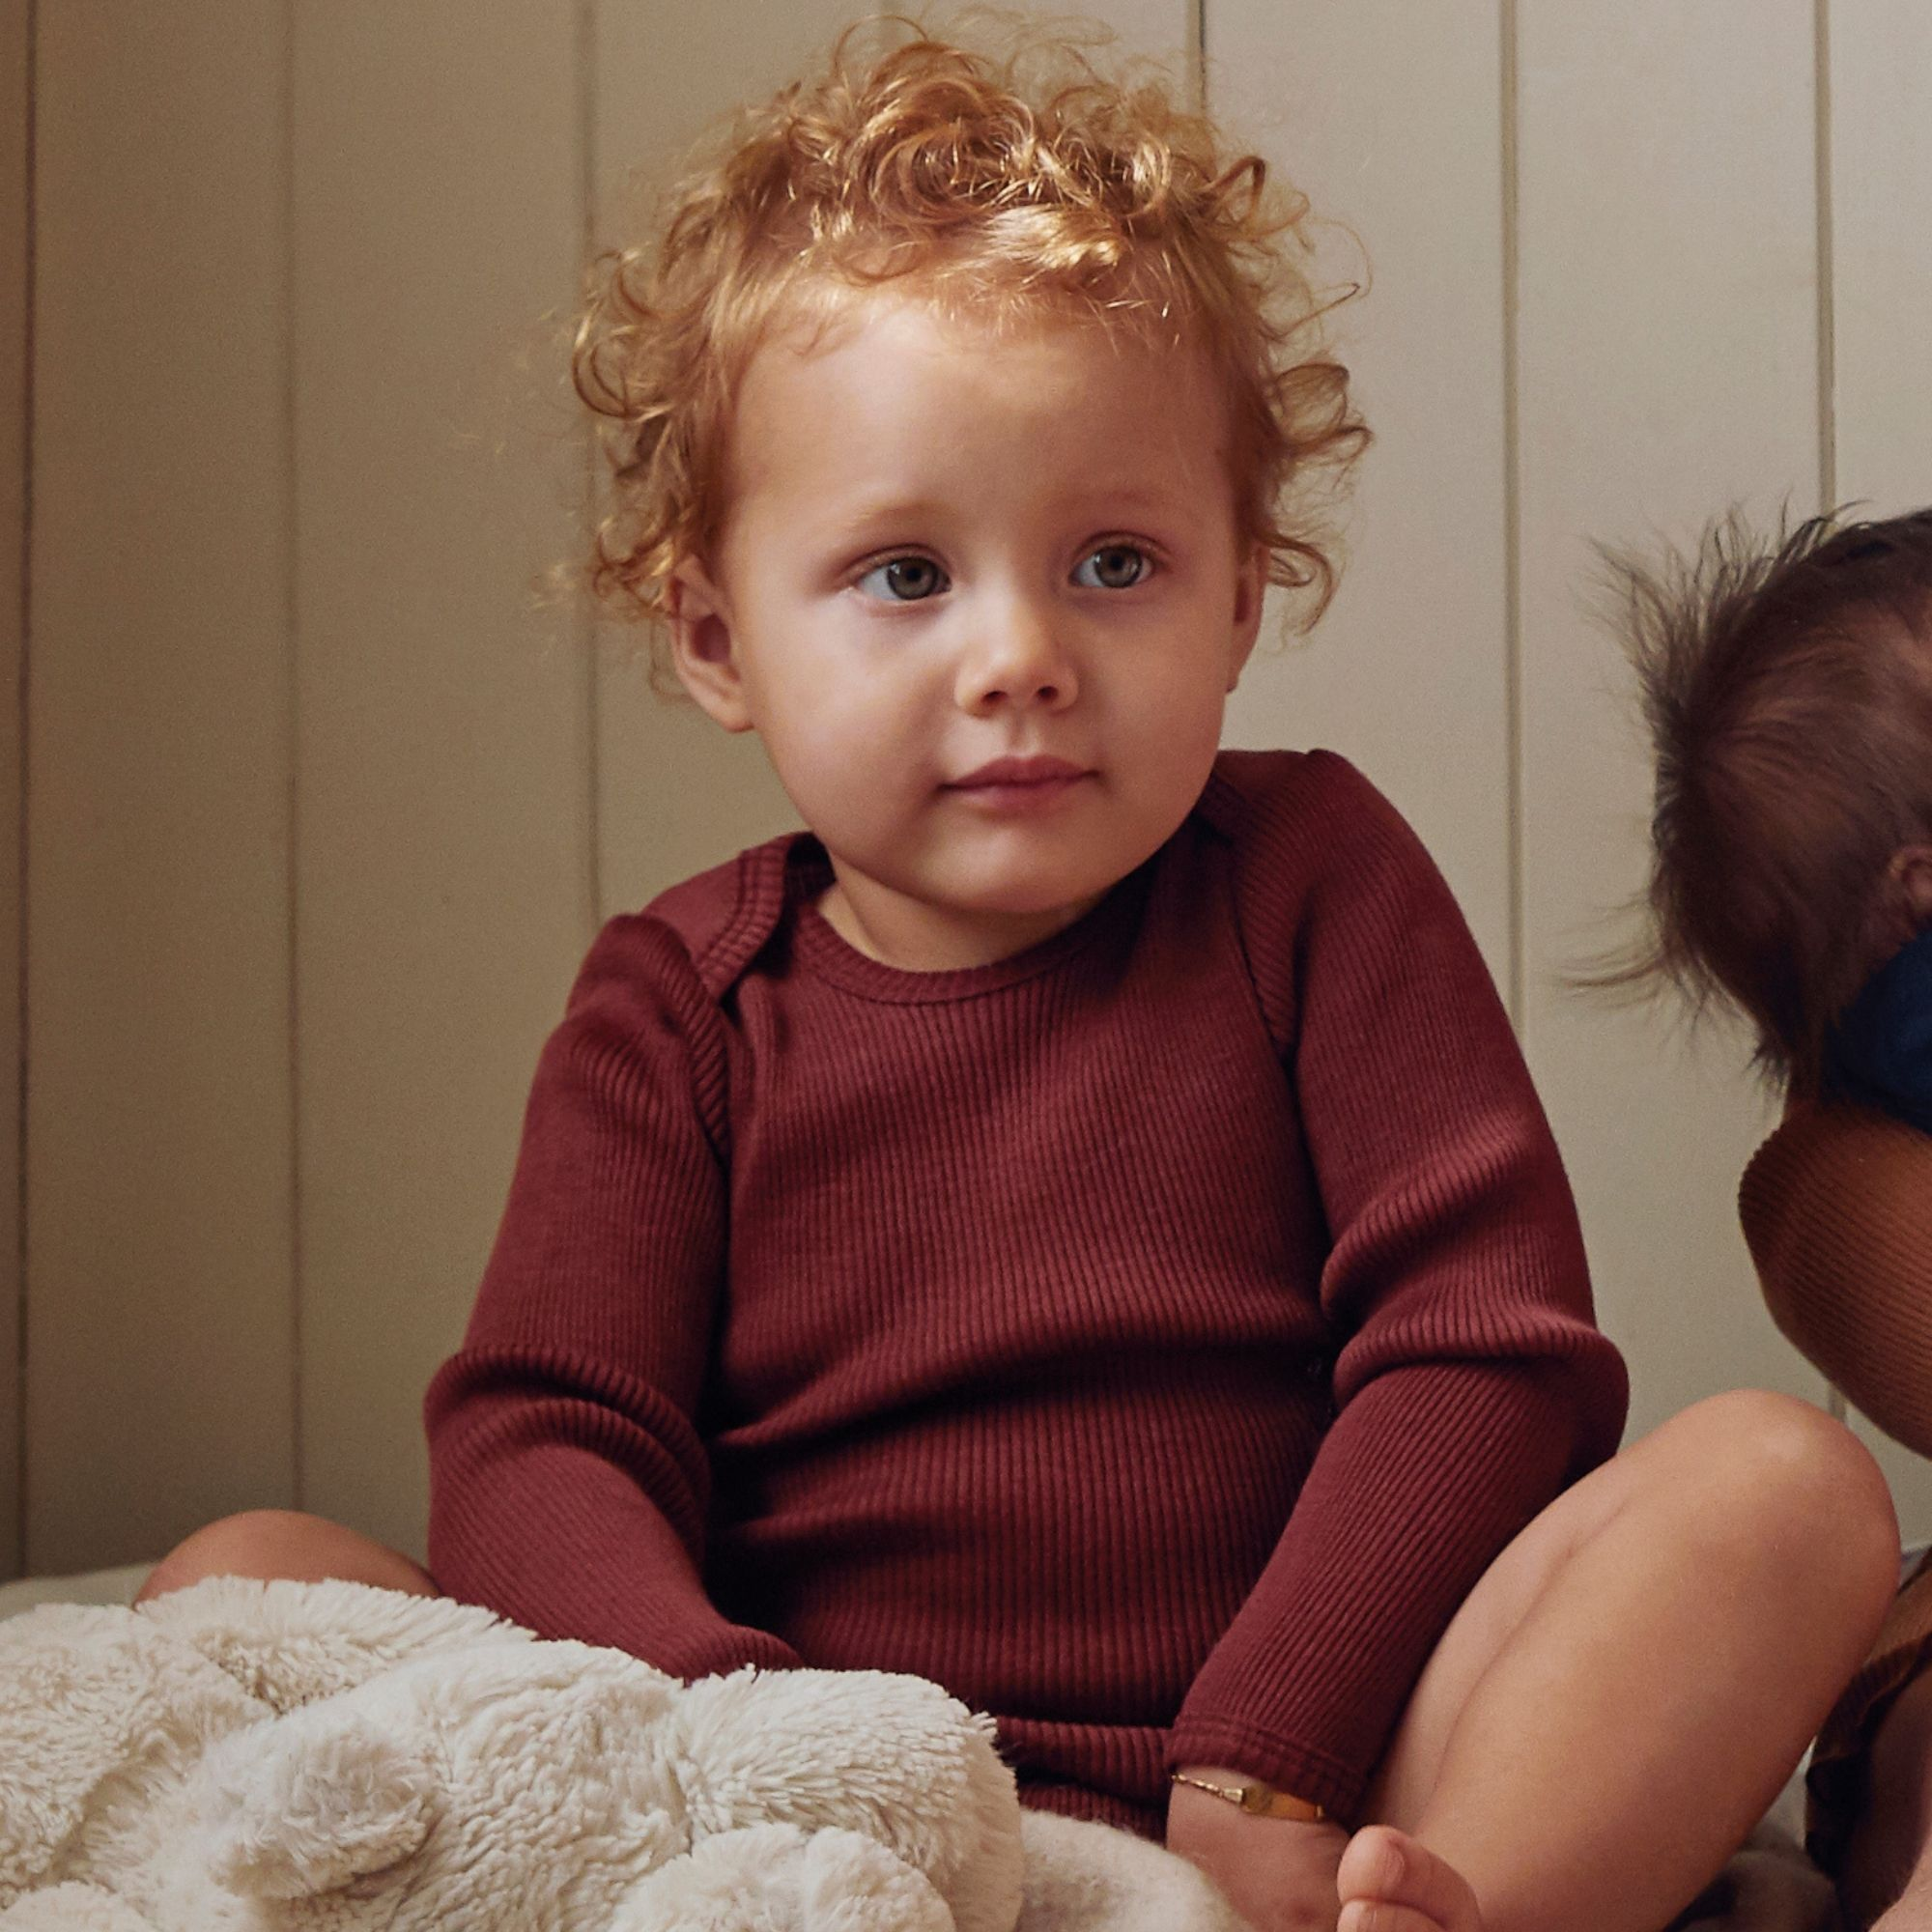 MINIMALISMA - Body bébé - 100 % laine mérinos - Rhubarbe